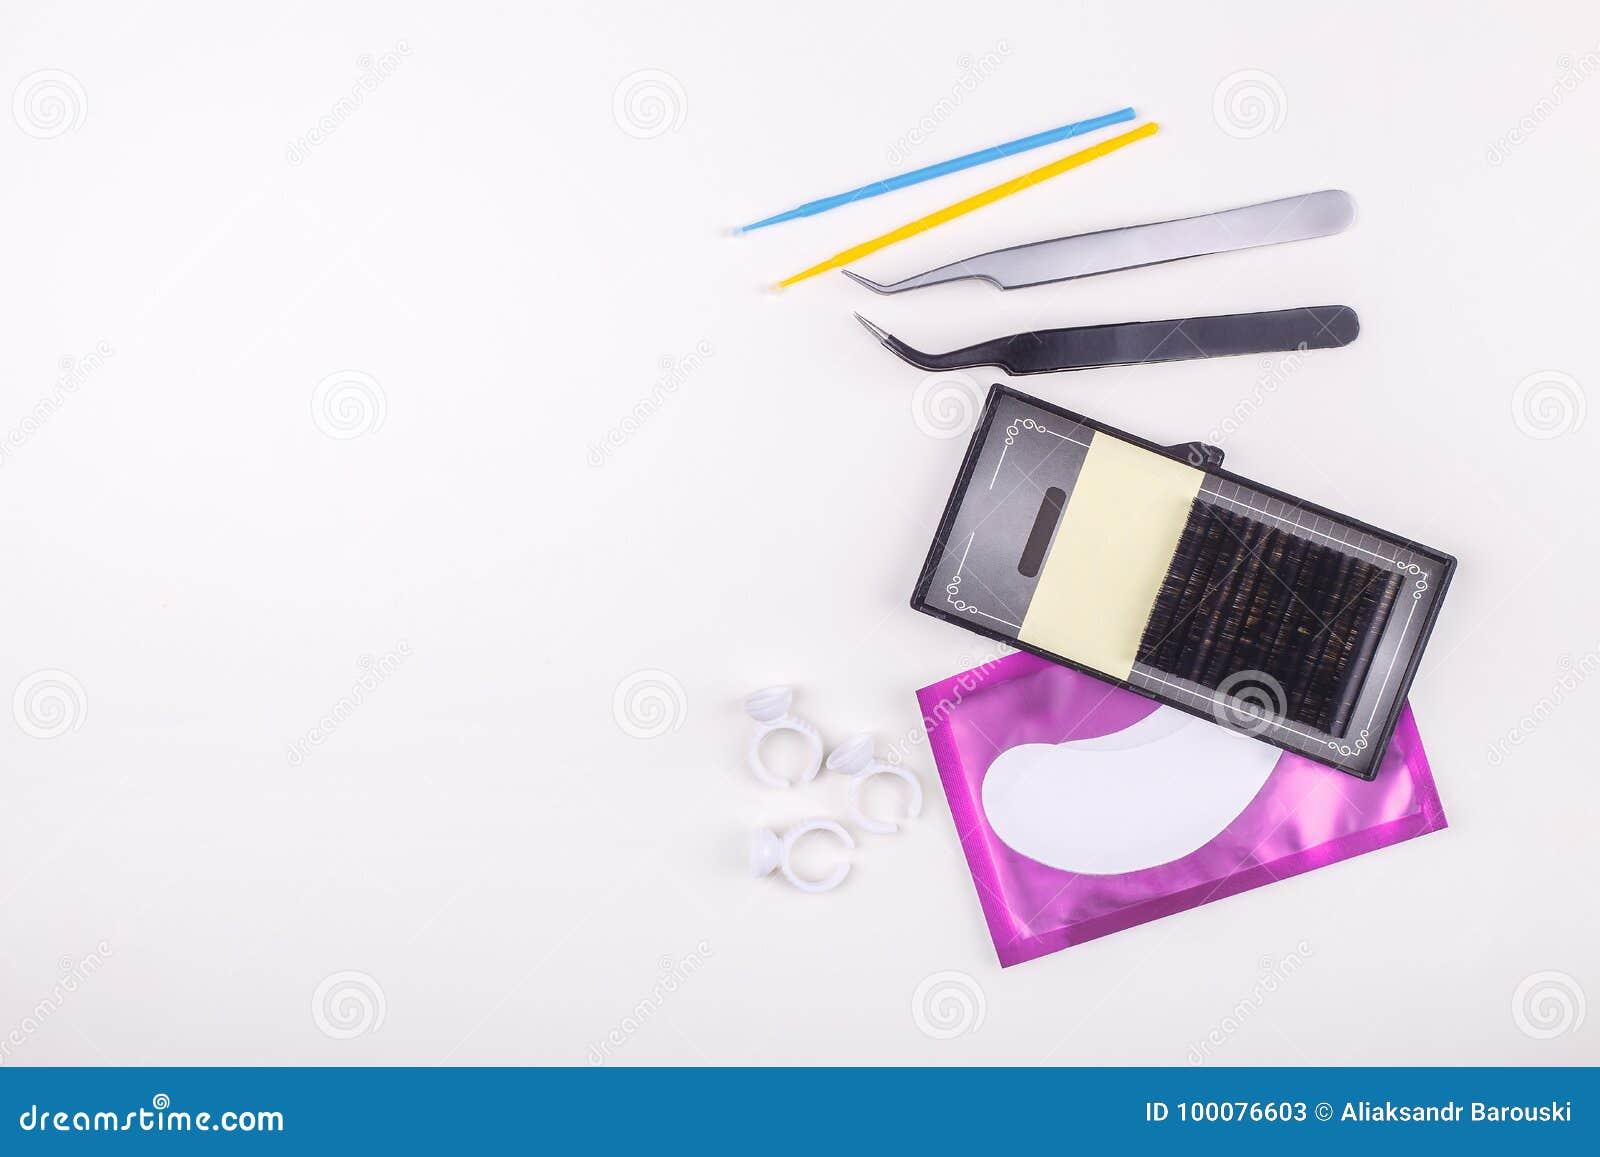 Eyelash Extension Tools On White Background Accessories For Eyelash